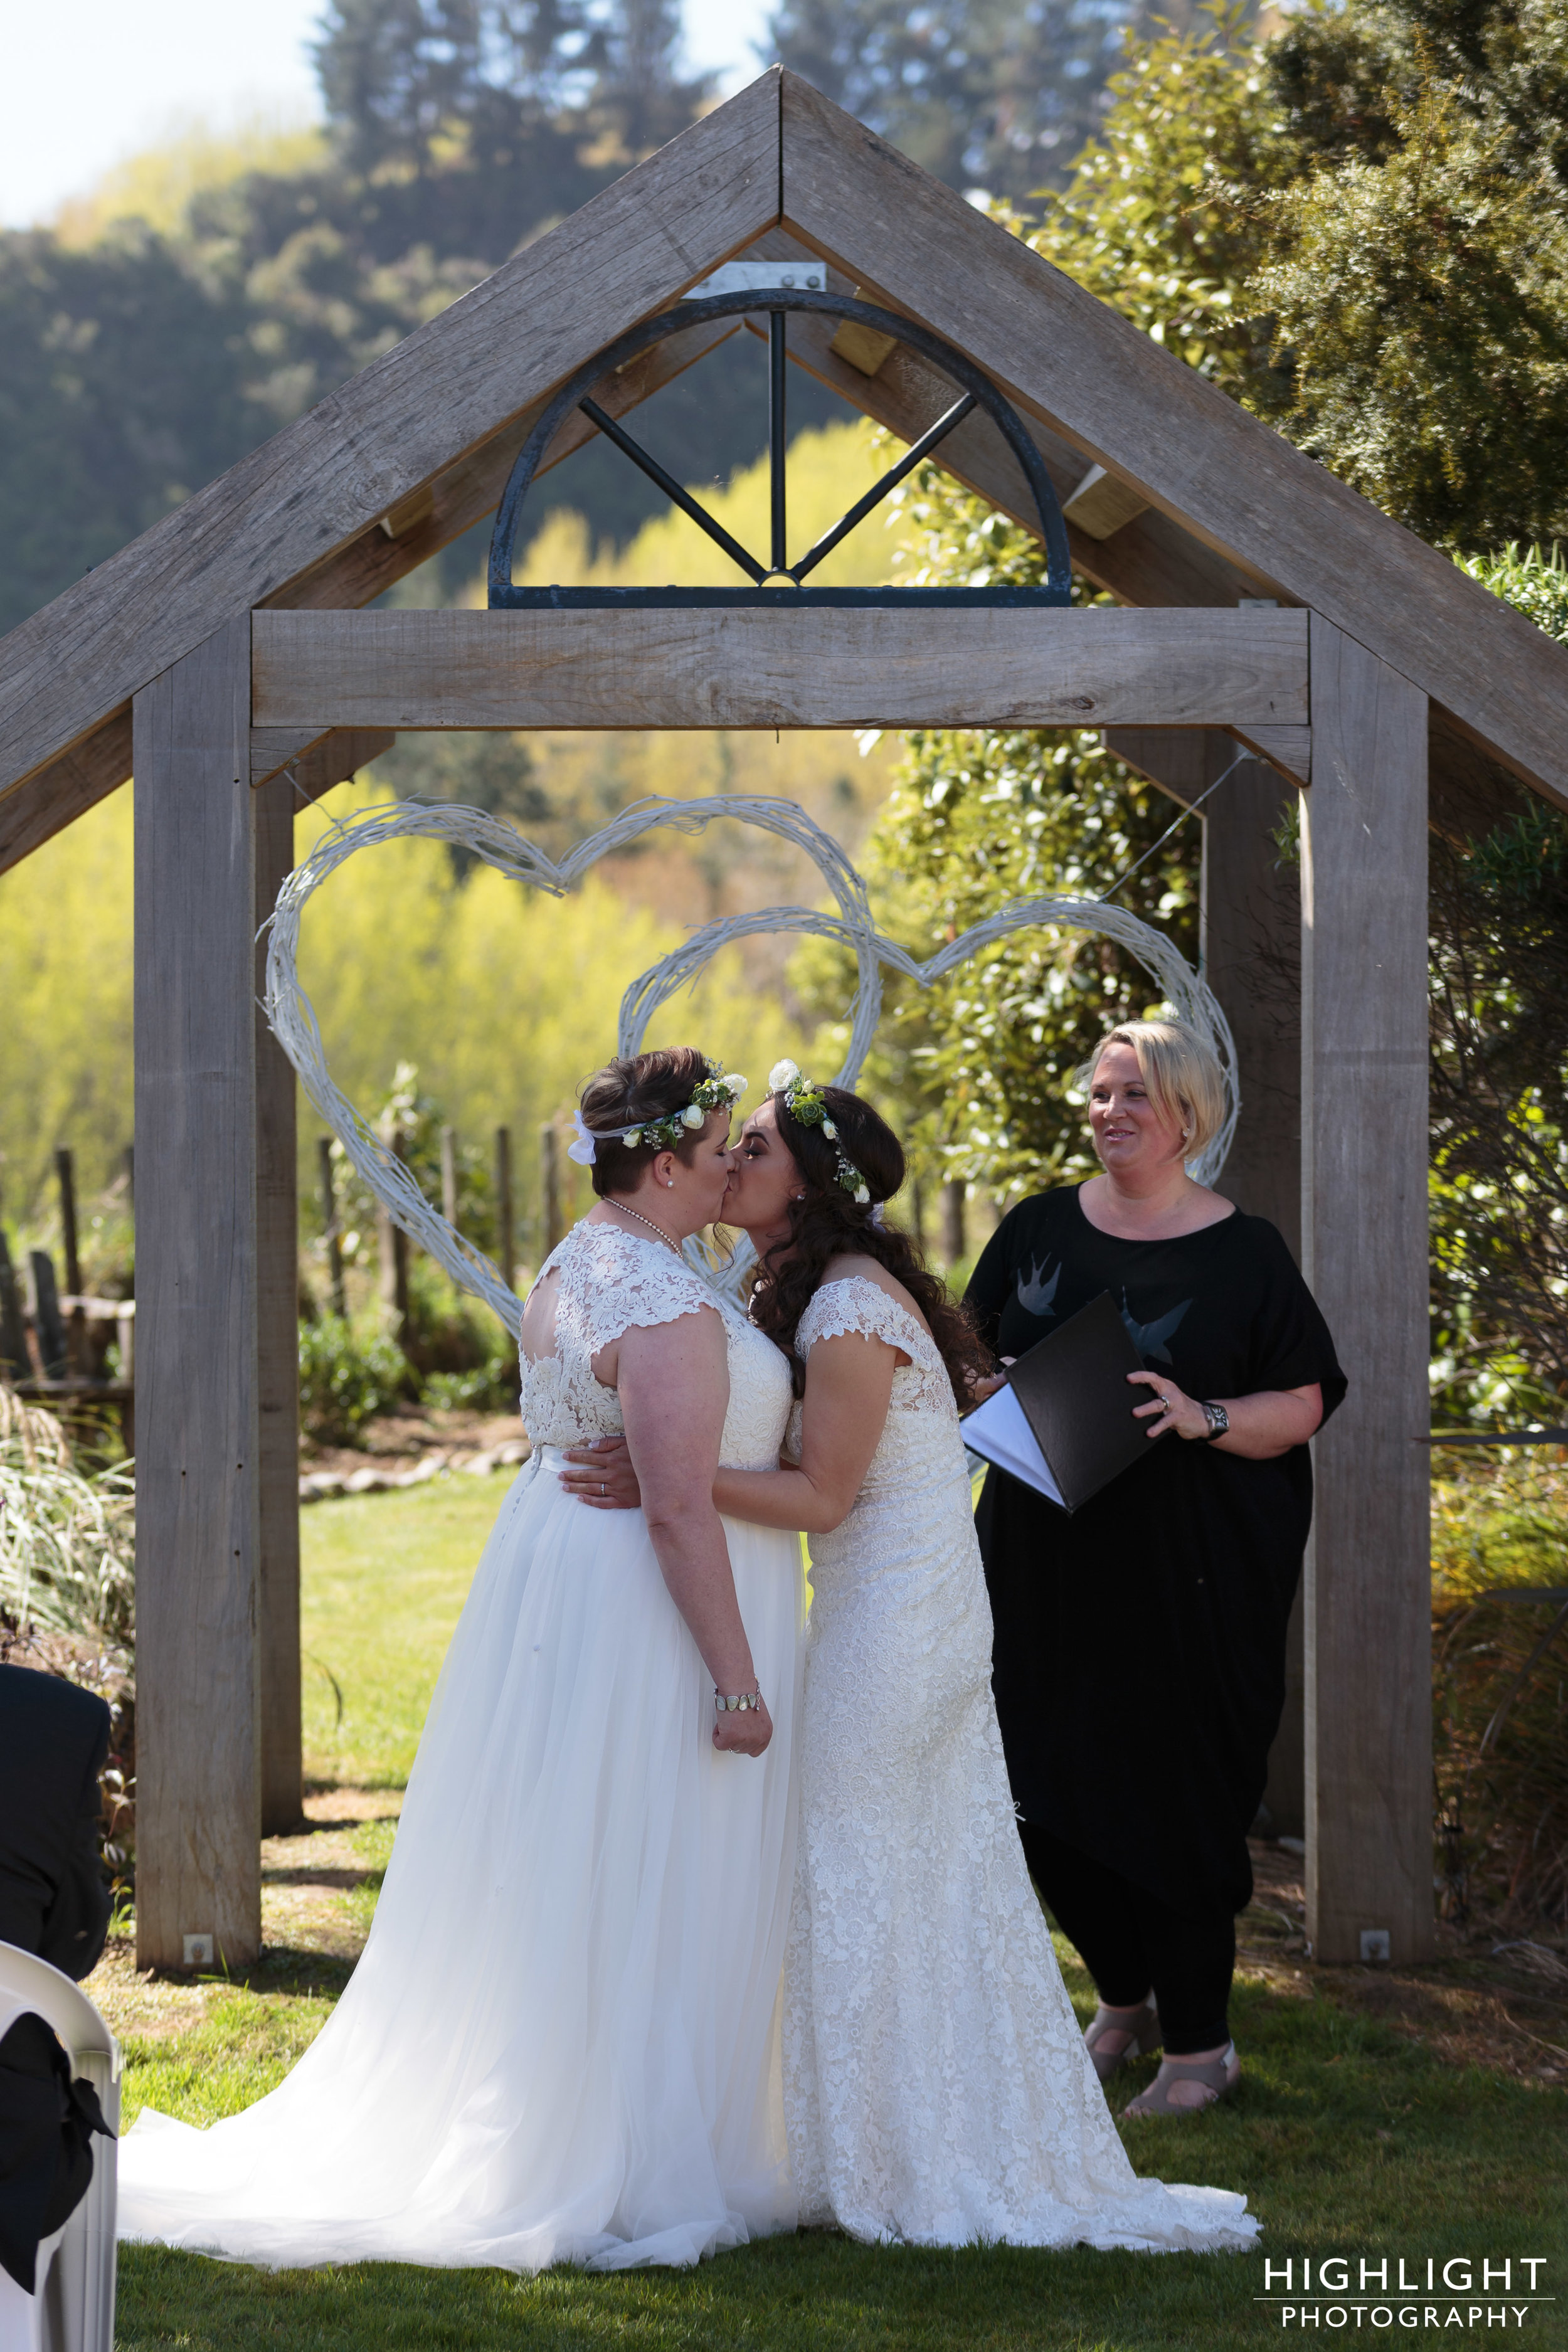 highlight_wedding_photography_makoura_lodge_manawatu_new_zealand-80.jpg